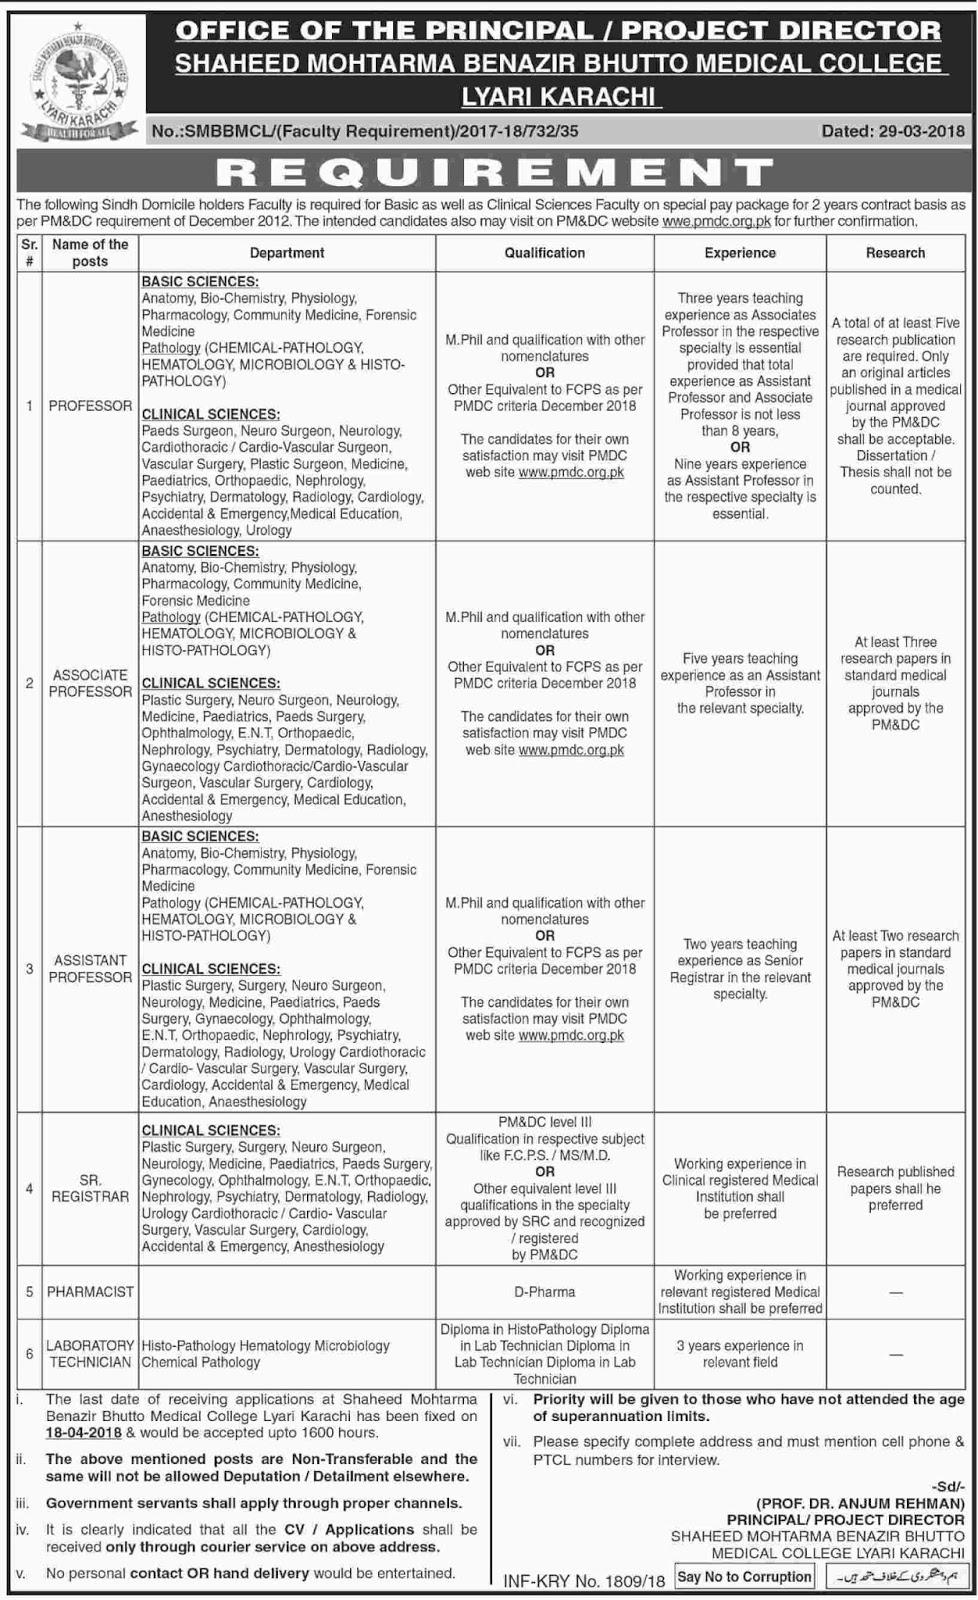 Shaheed Mohtarma Benazir Bhutto Medical College Karachi Jobs 2018